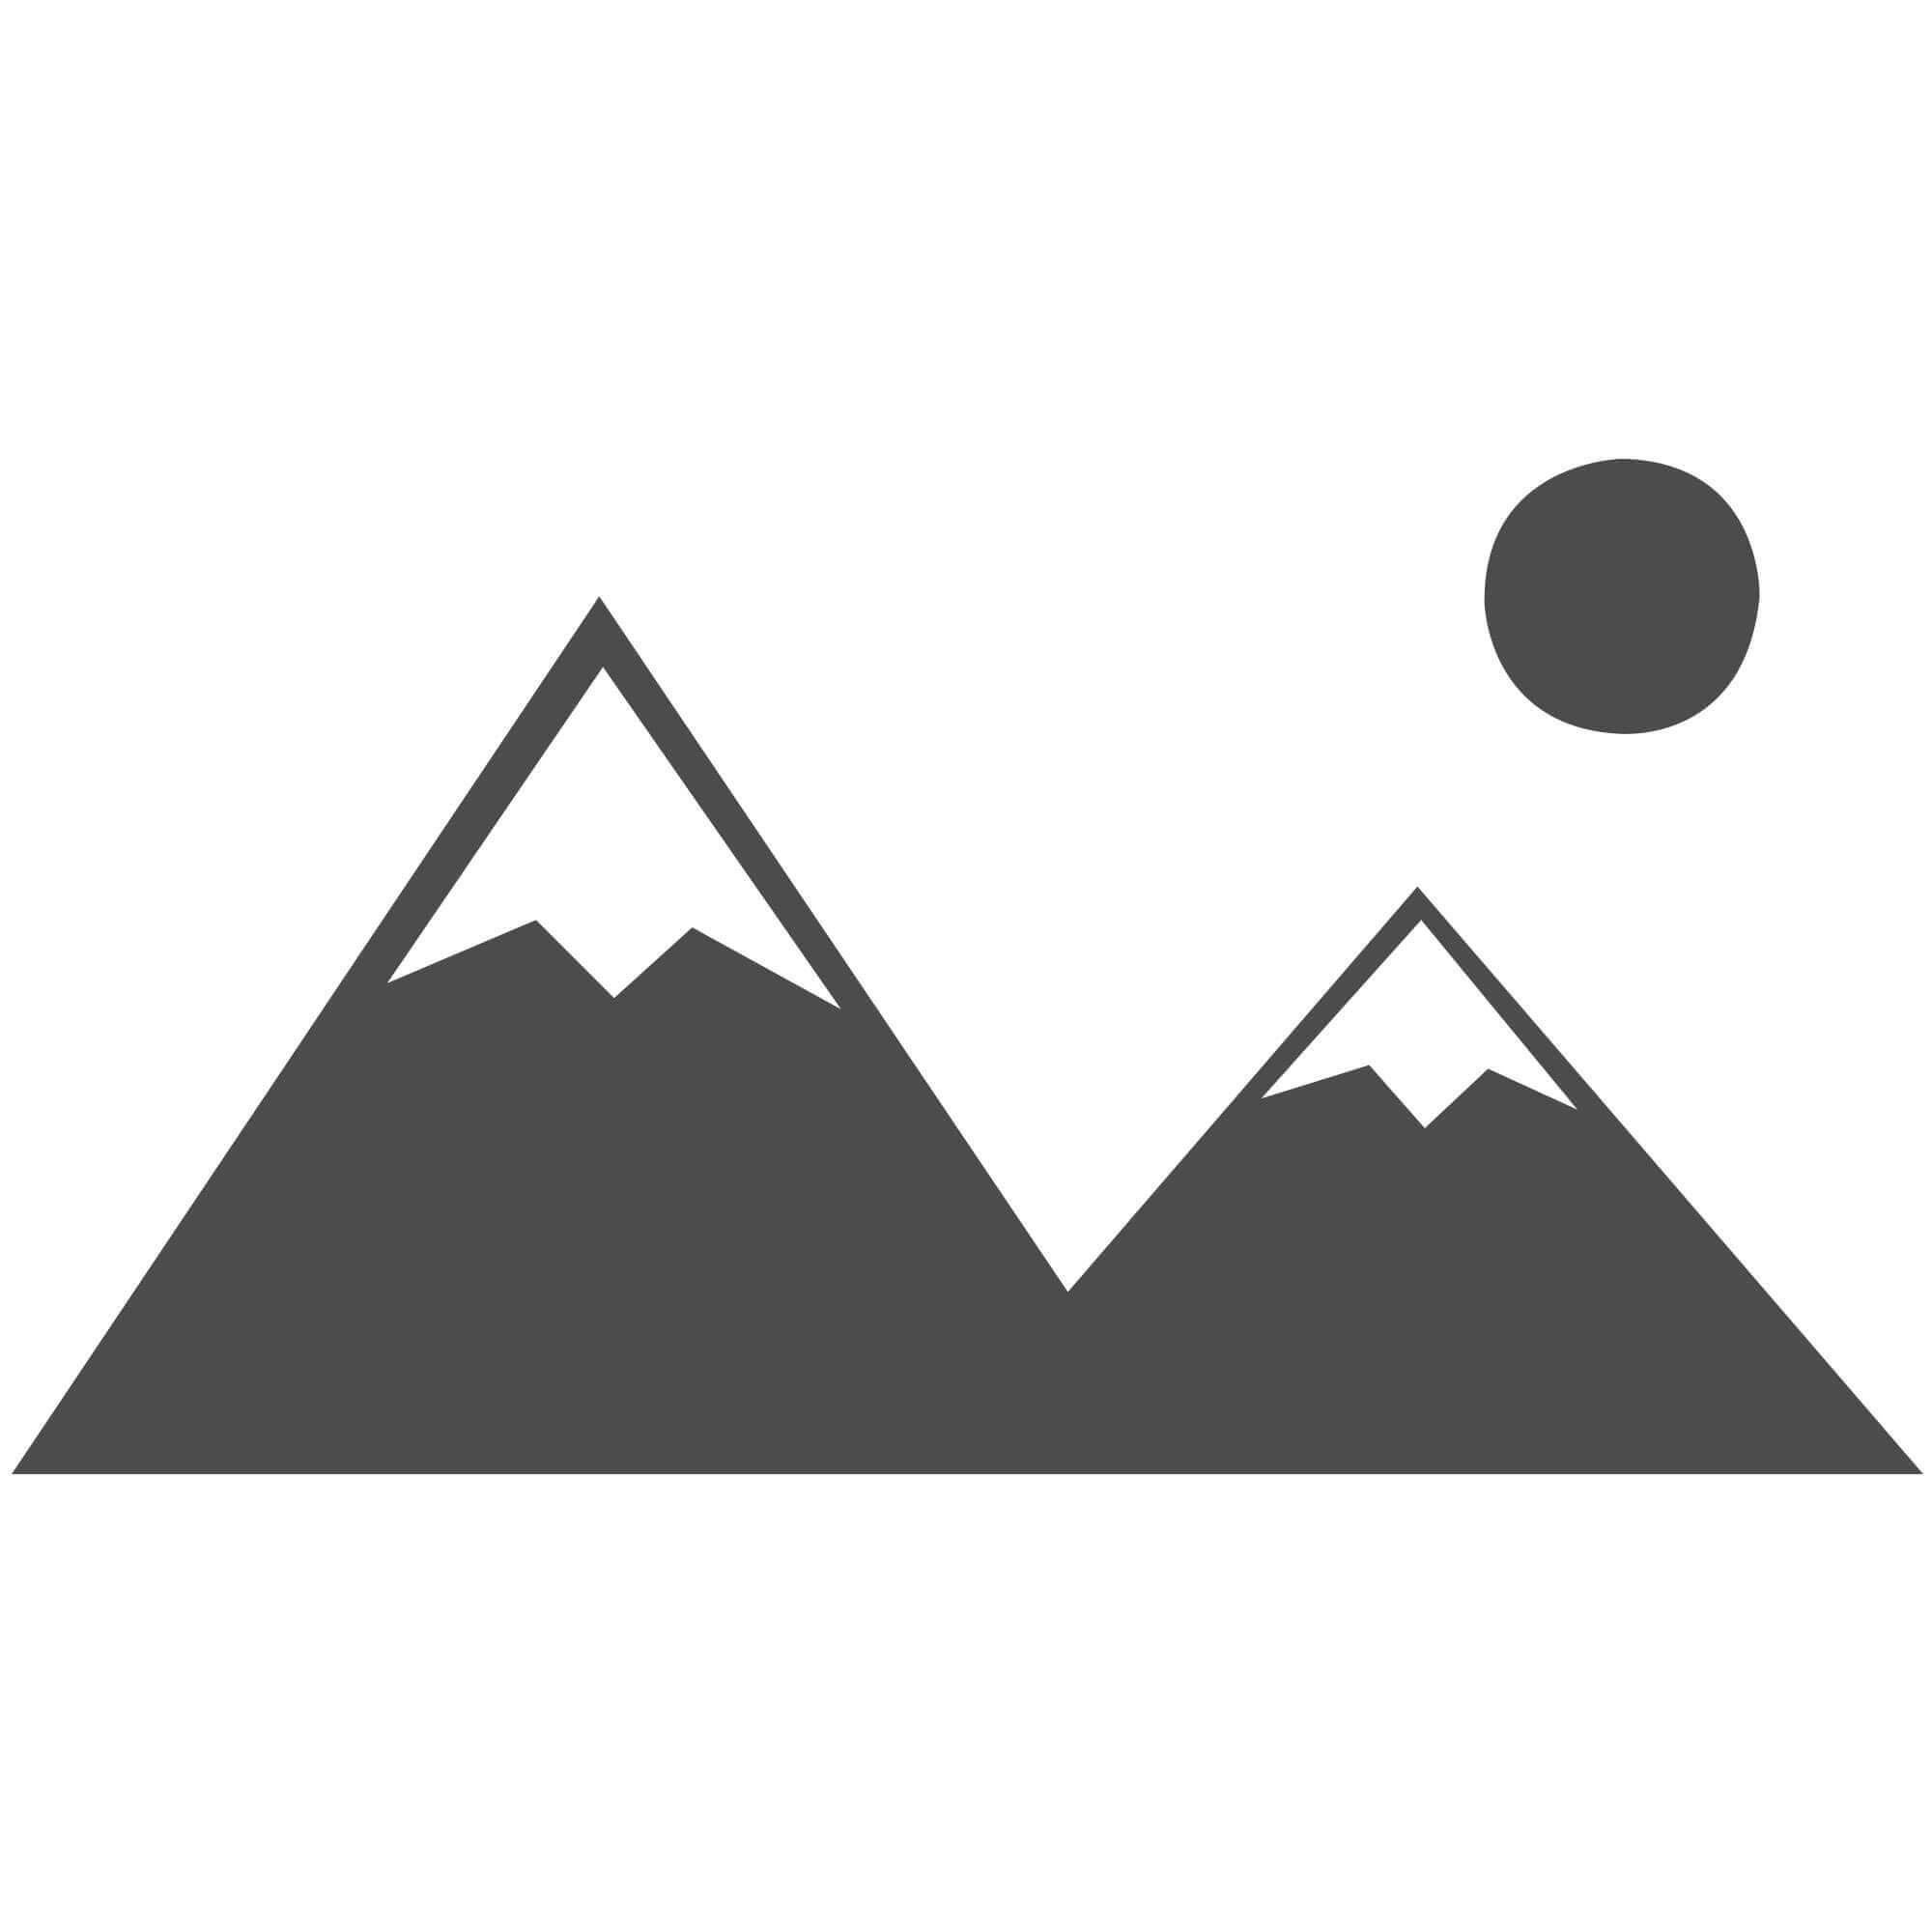 "Galleria Rug - Border Blue 63138 6191 - Size 160 x 230 cm (5'3"" x 7'7"")"